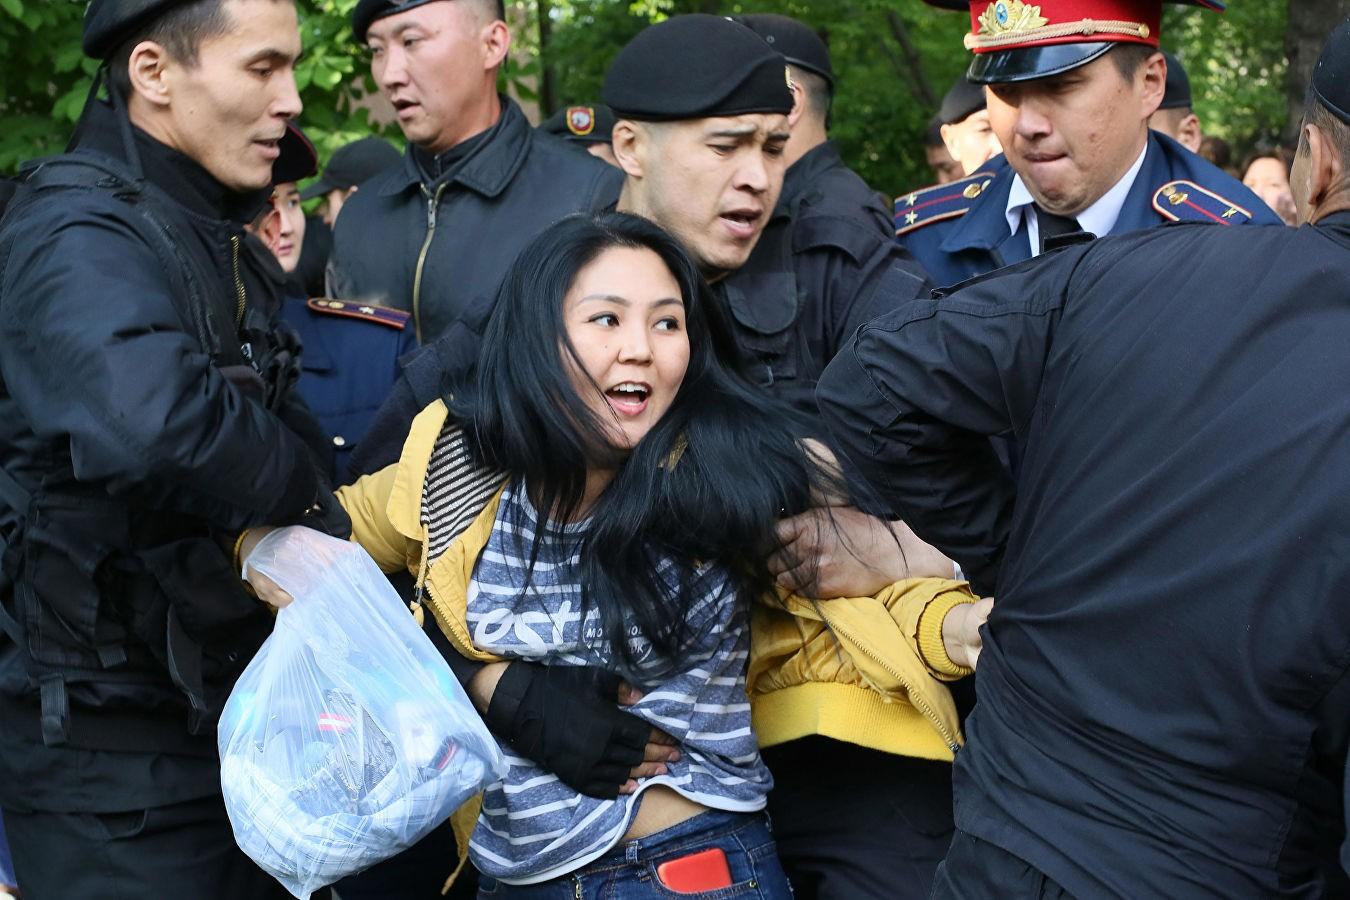 Что происходит на площадях казахстана фото